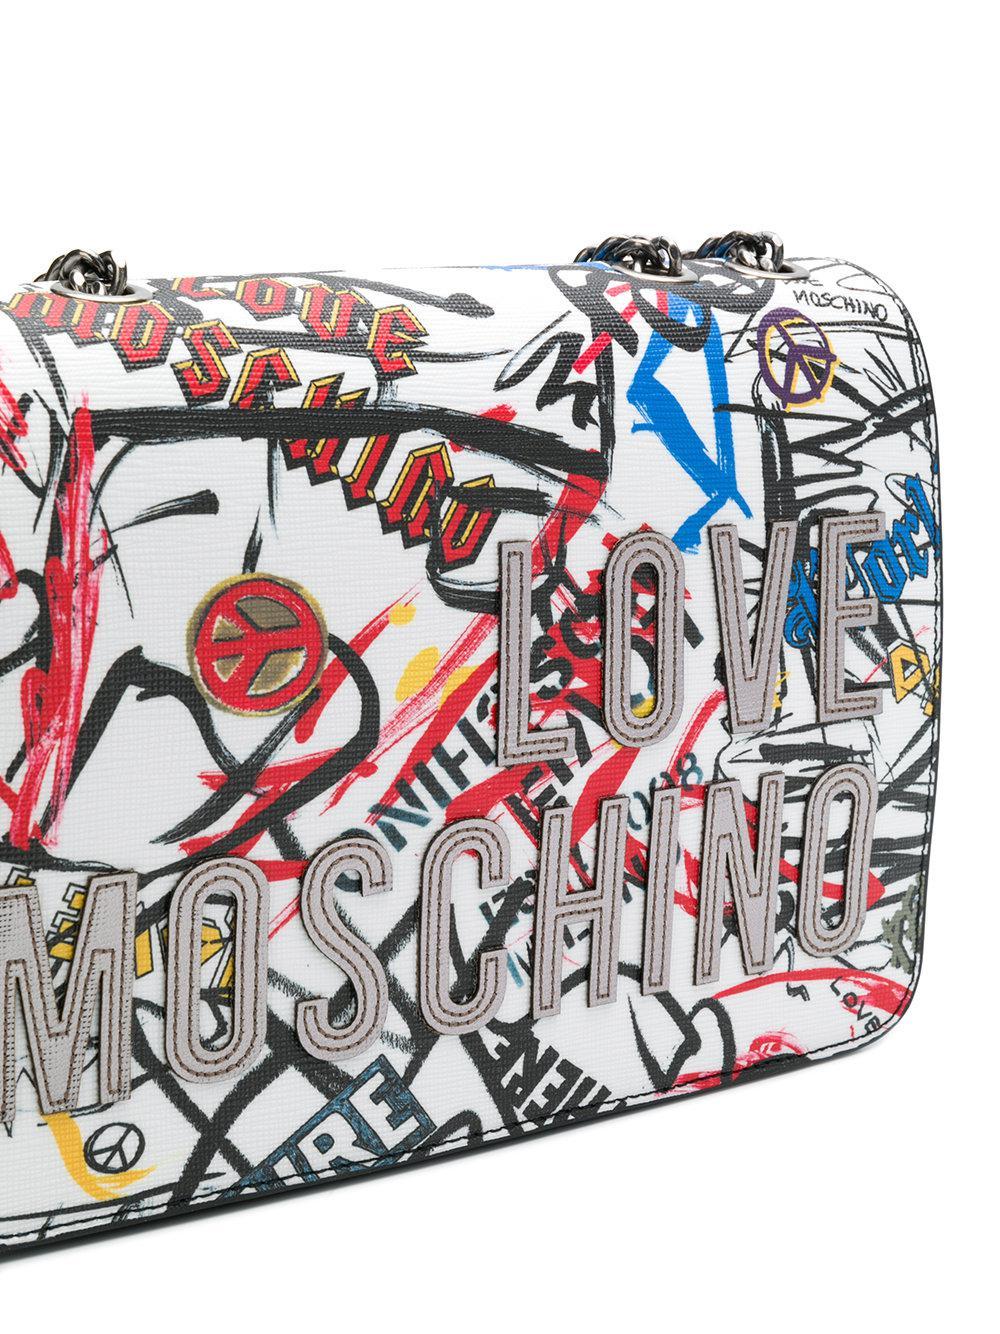 ec79dfca889 Love Moschino Graffiti Shoulder Bag in White - Lyst